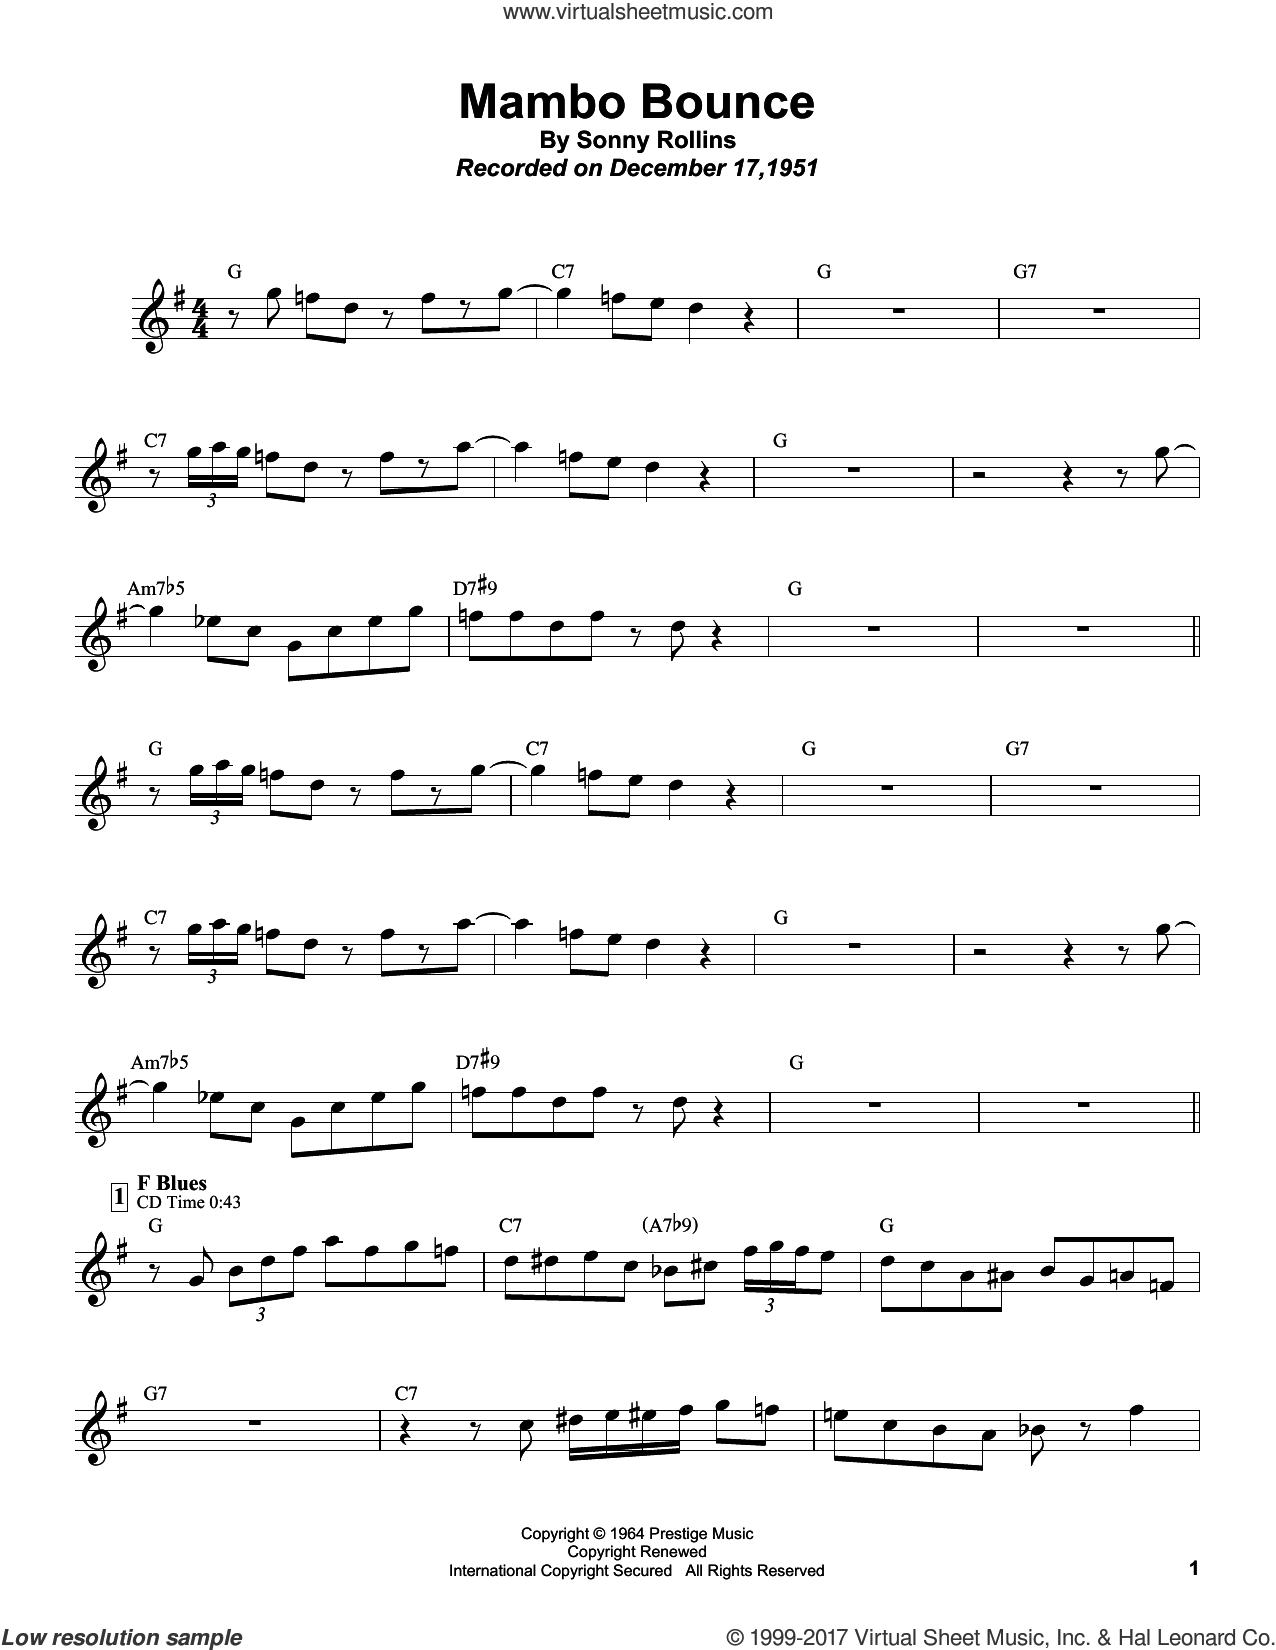 Mambo Bounce sheet music for tenor saxophone solo (transcription) by Sonny Rollins, Art Blakey, Kenny Drew, Modern Jazz Quartet and Sonny Rollins With The Modern Jazz Quartet, intermediate tenor saxophone (transcription)